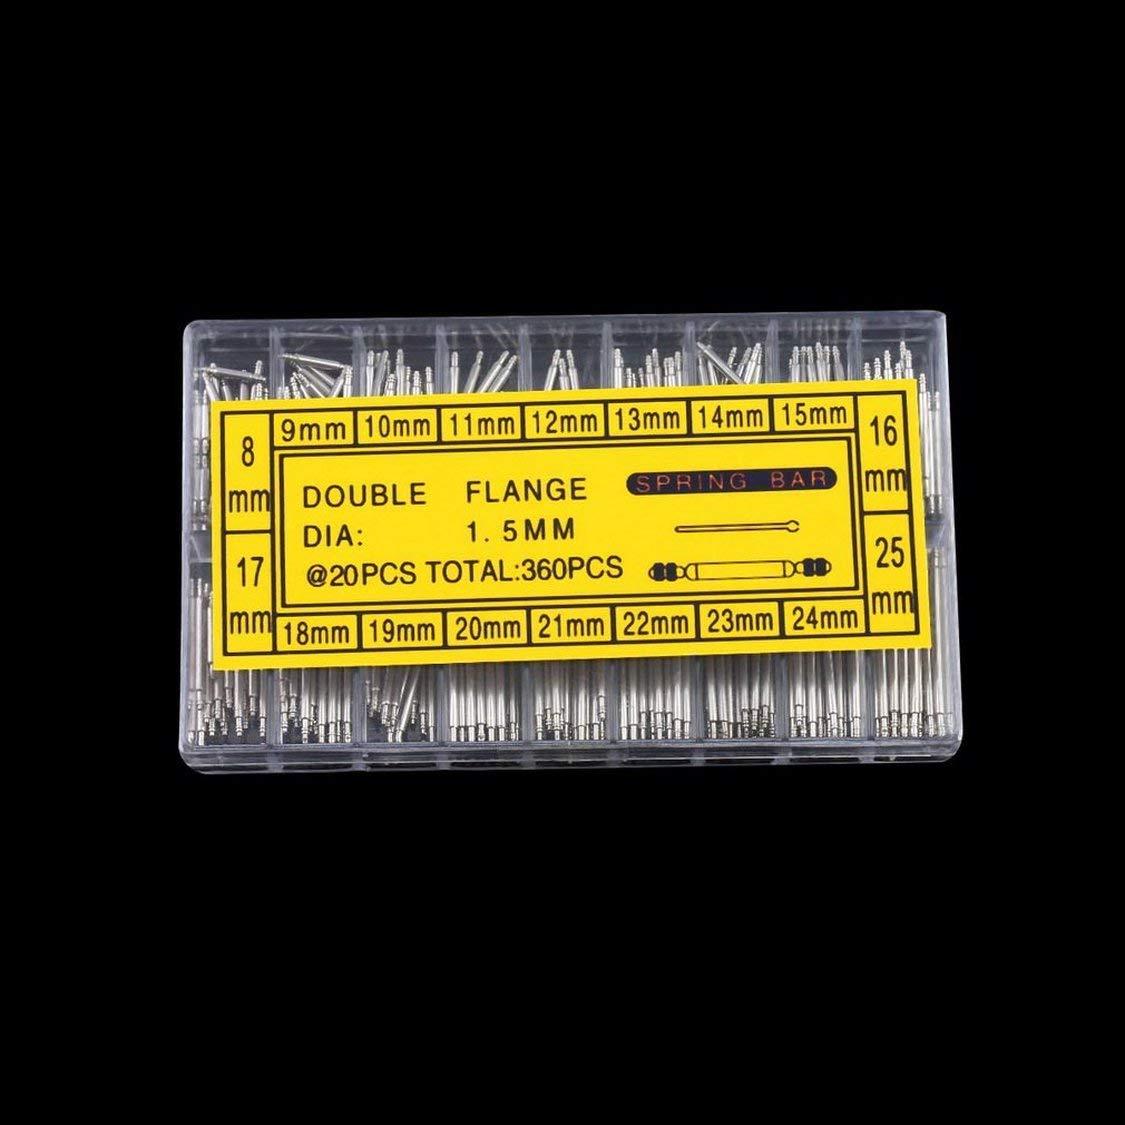 Vige Professionelle 360 st/ücke 8-25mm Uhrenarmband Fr/ühling Bars Strap Link Pins Entfernen Reparatur Uhrmacher Uhr Reparatur Werkzeuge